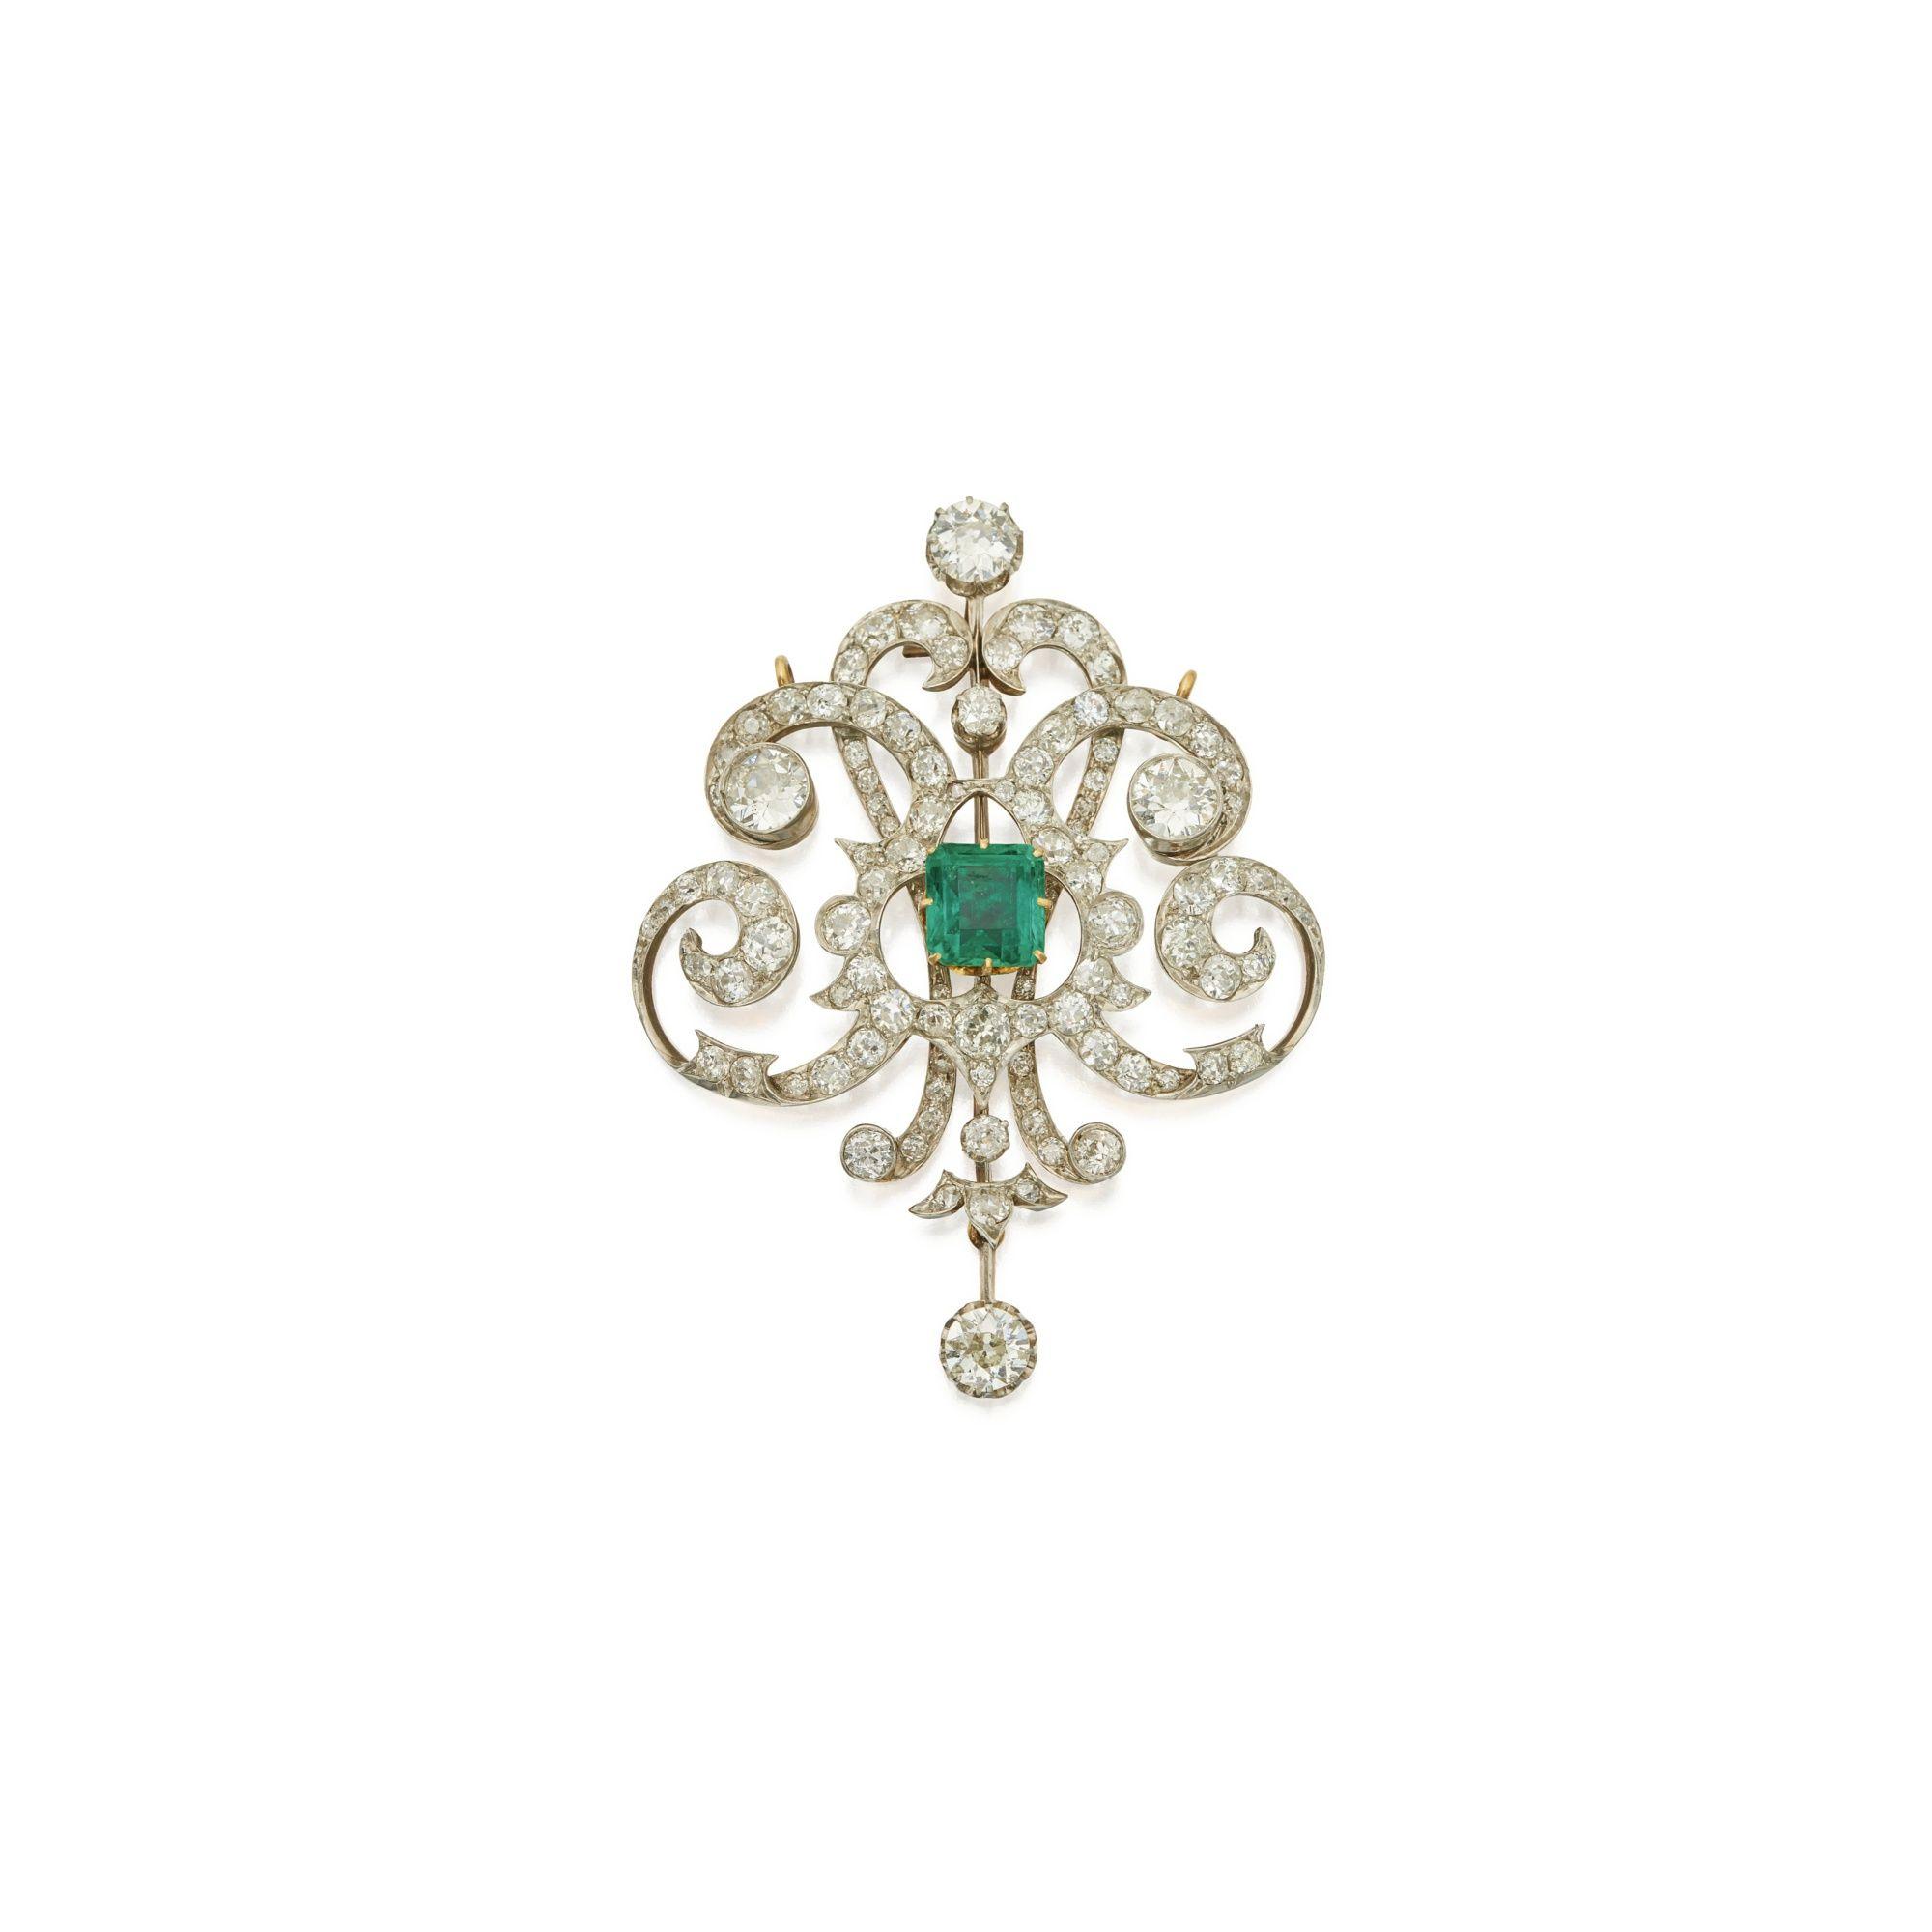 diamond & emerald pendant/brooch ||| sotheby's n09695lot9klvven